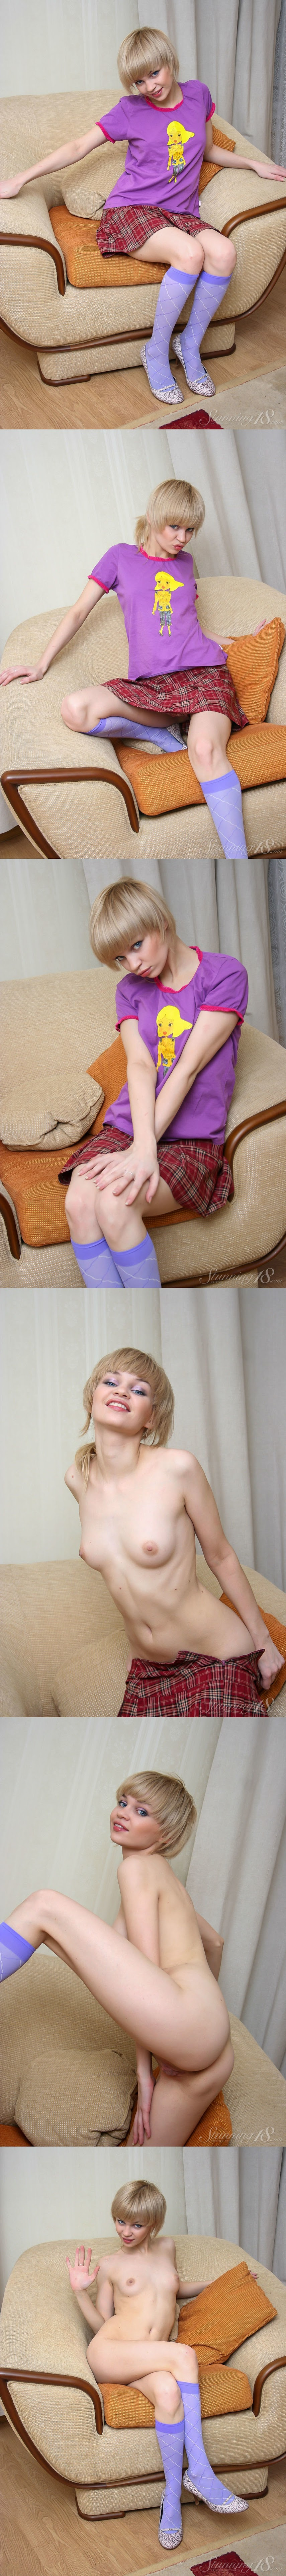 [Stunning18] Cindy - Beauty